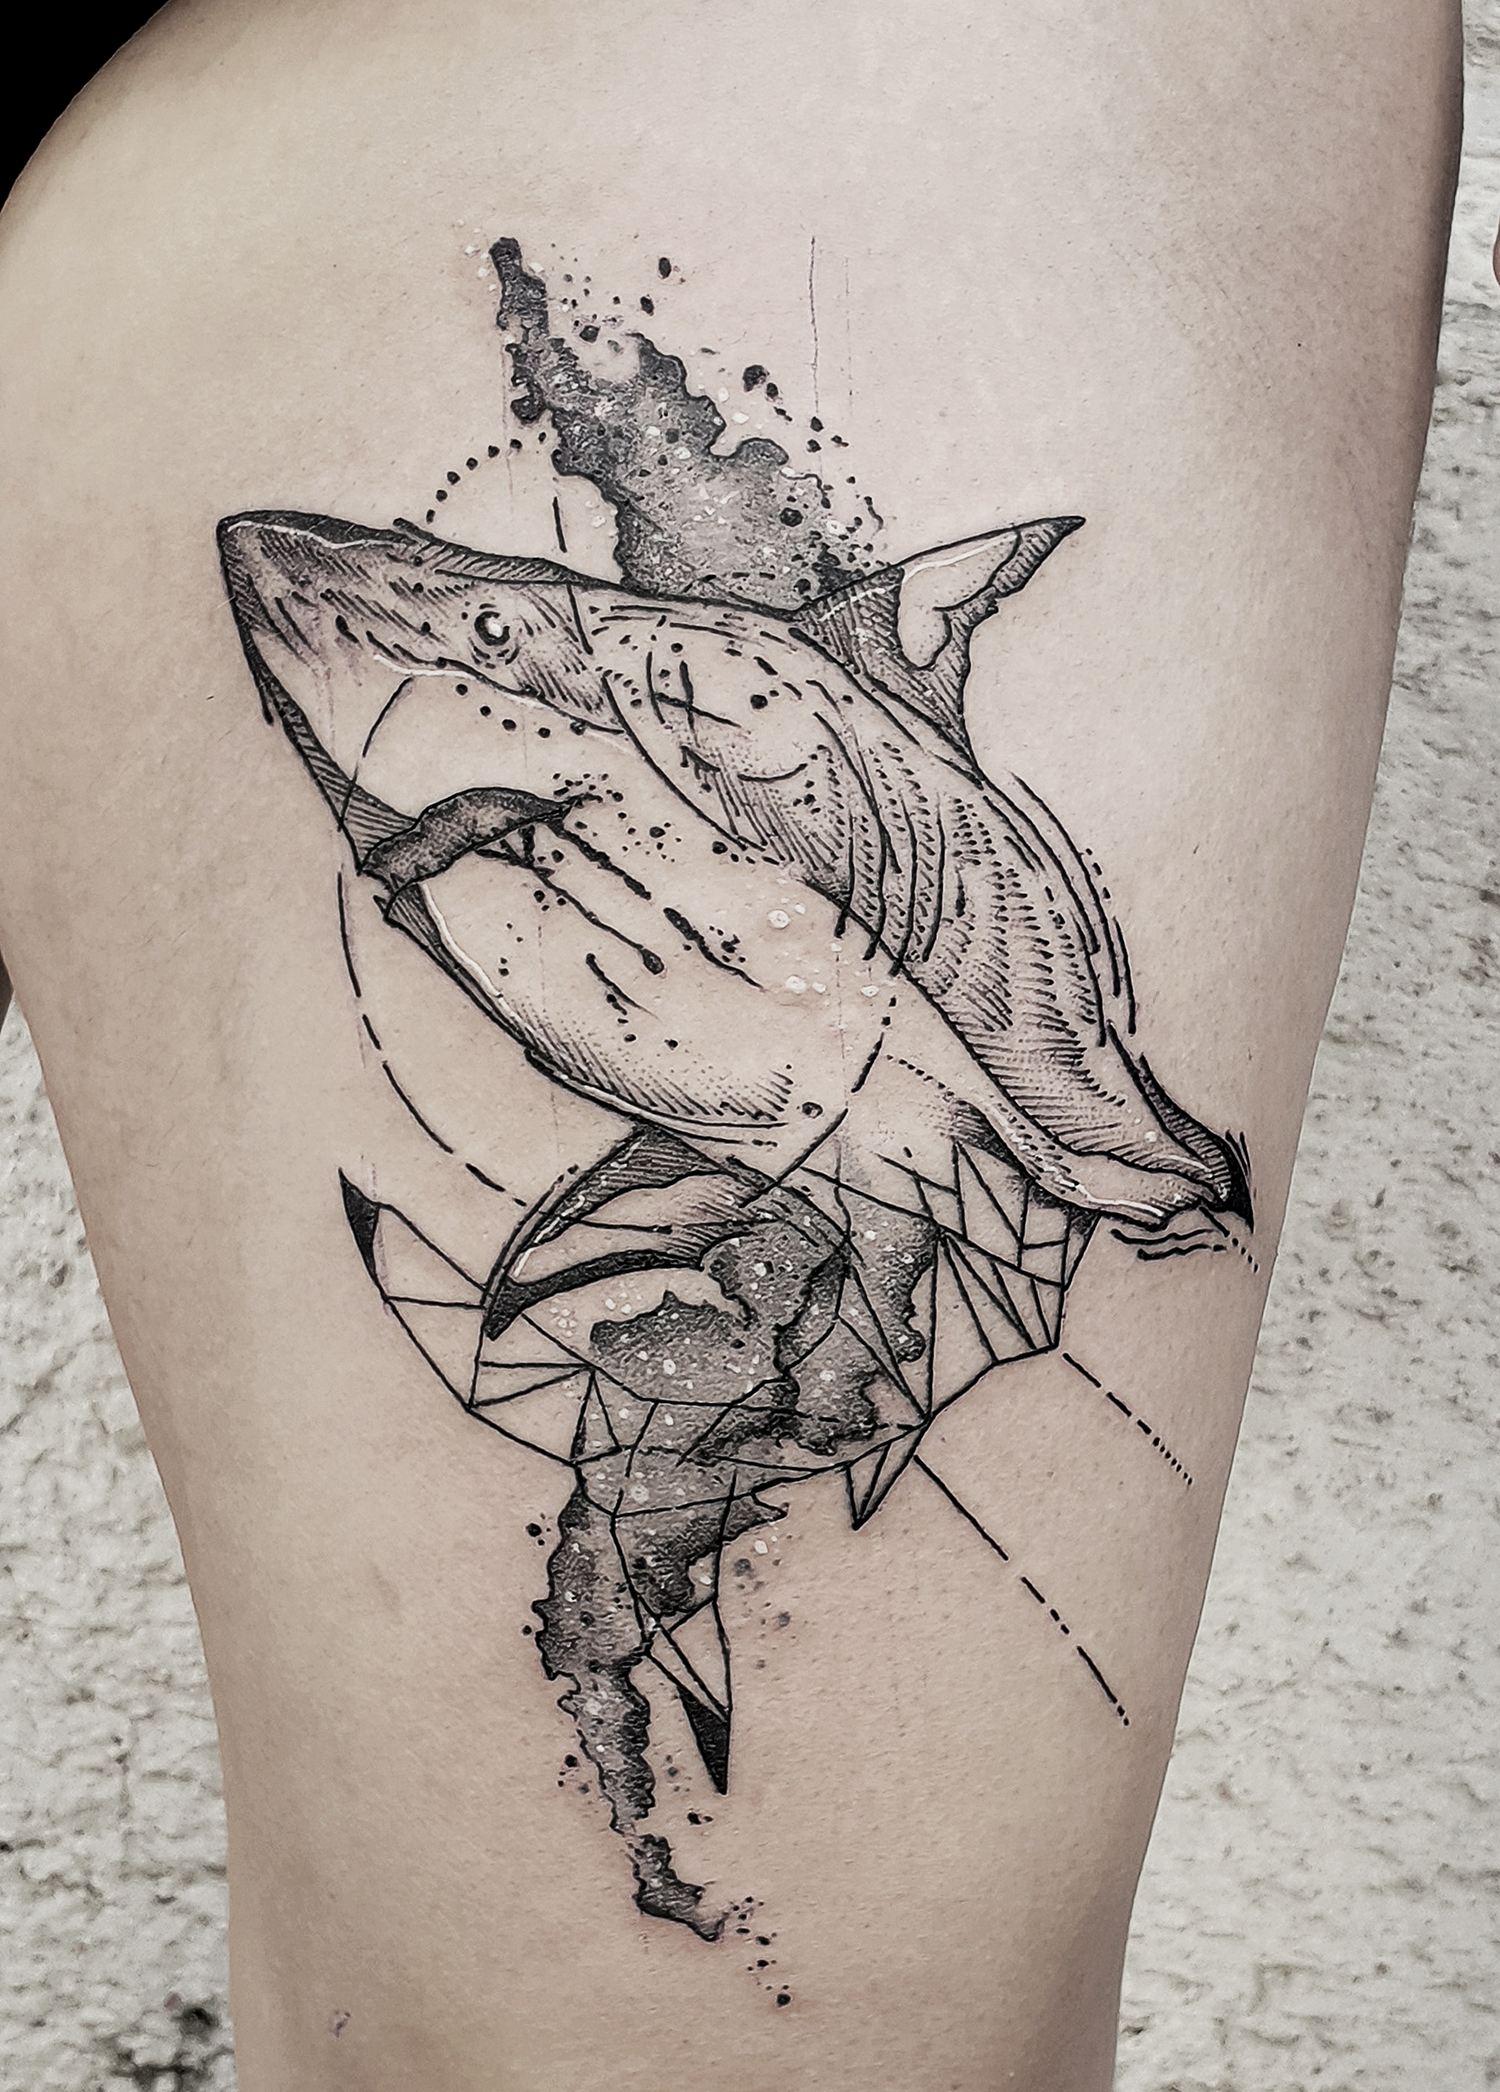 illustrative blackwork tattoo of shark